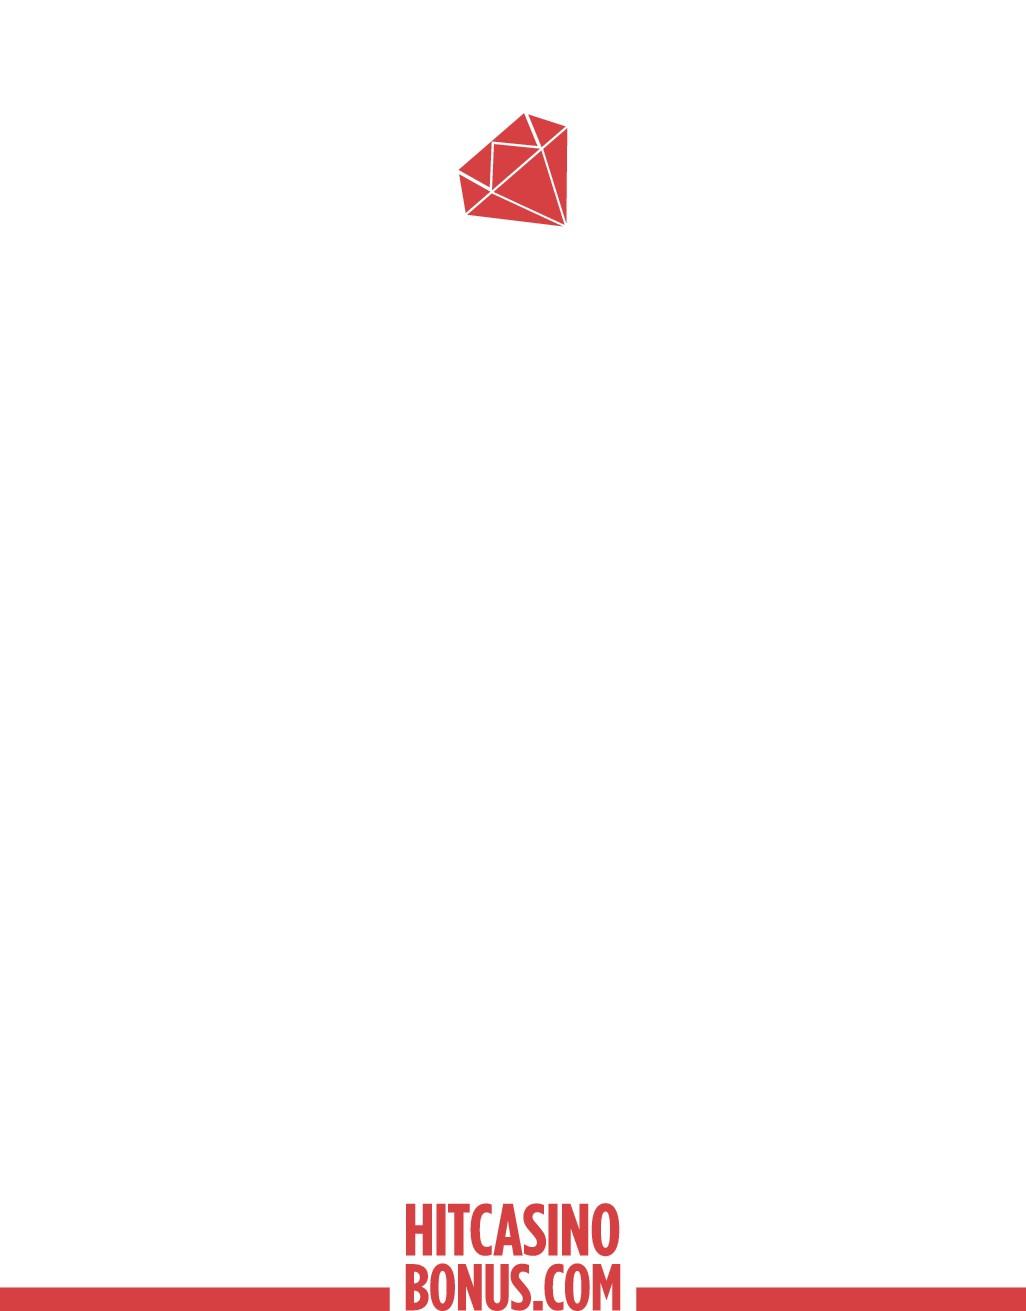 Design a minimalistic letterhead for HitCasinoBonus.com